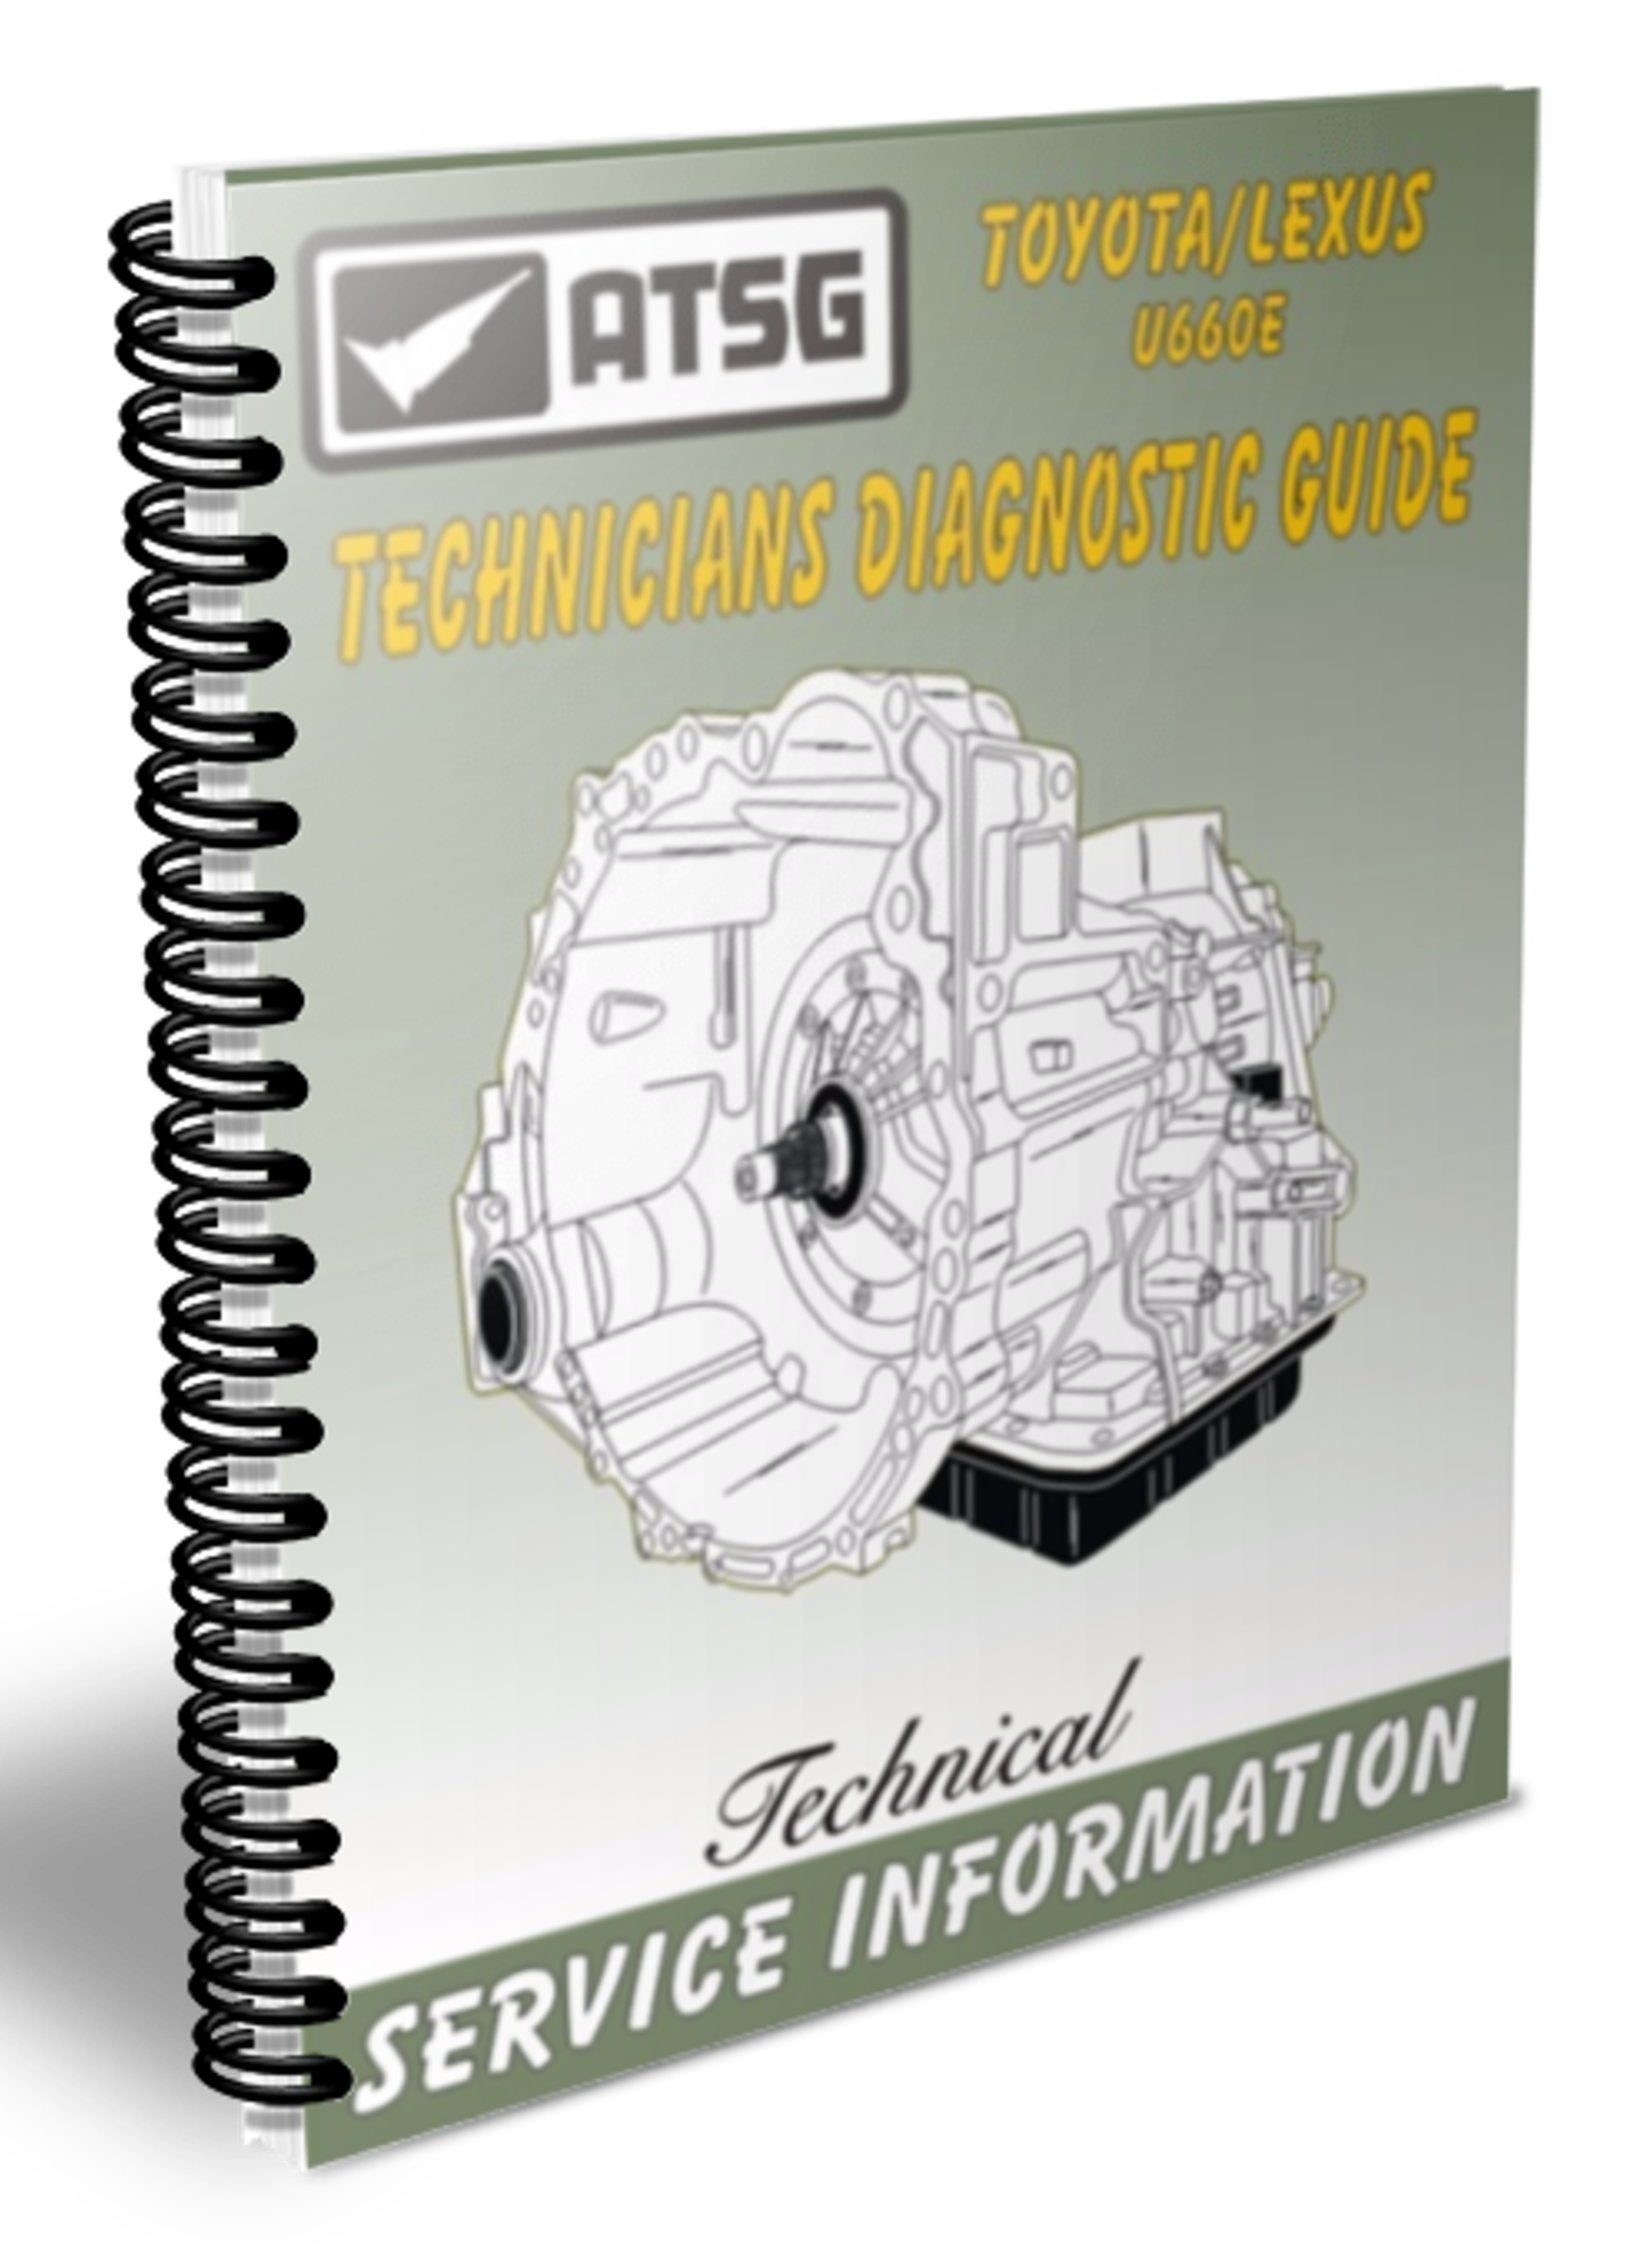 ATSG Toyota U660E Technician's Guide